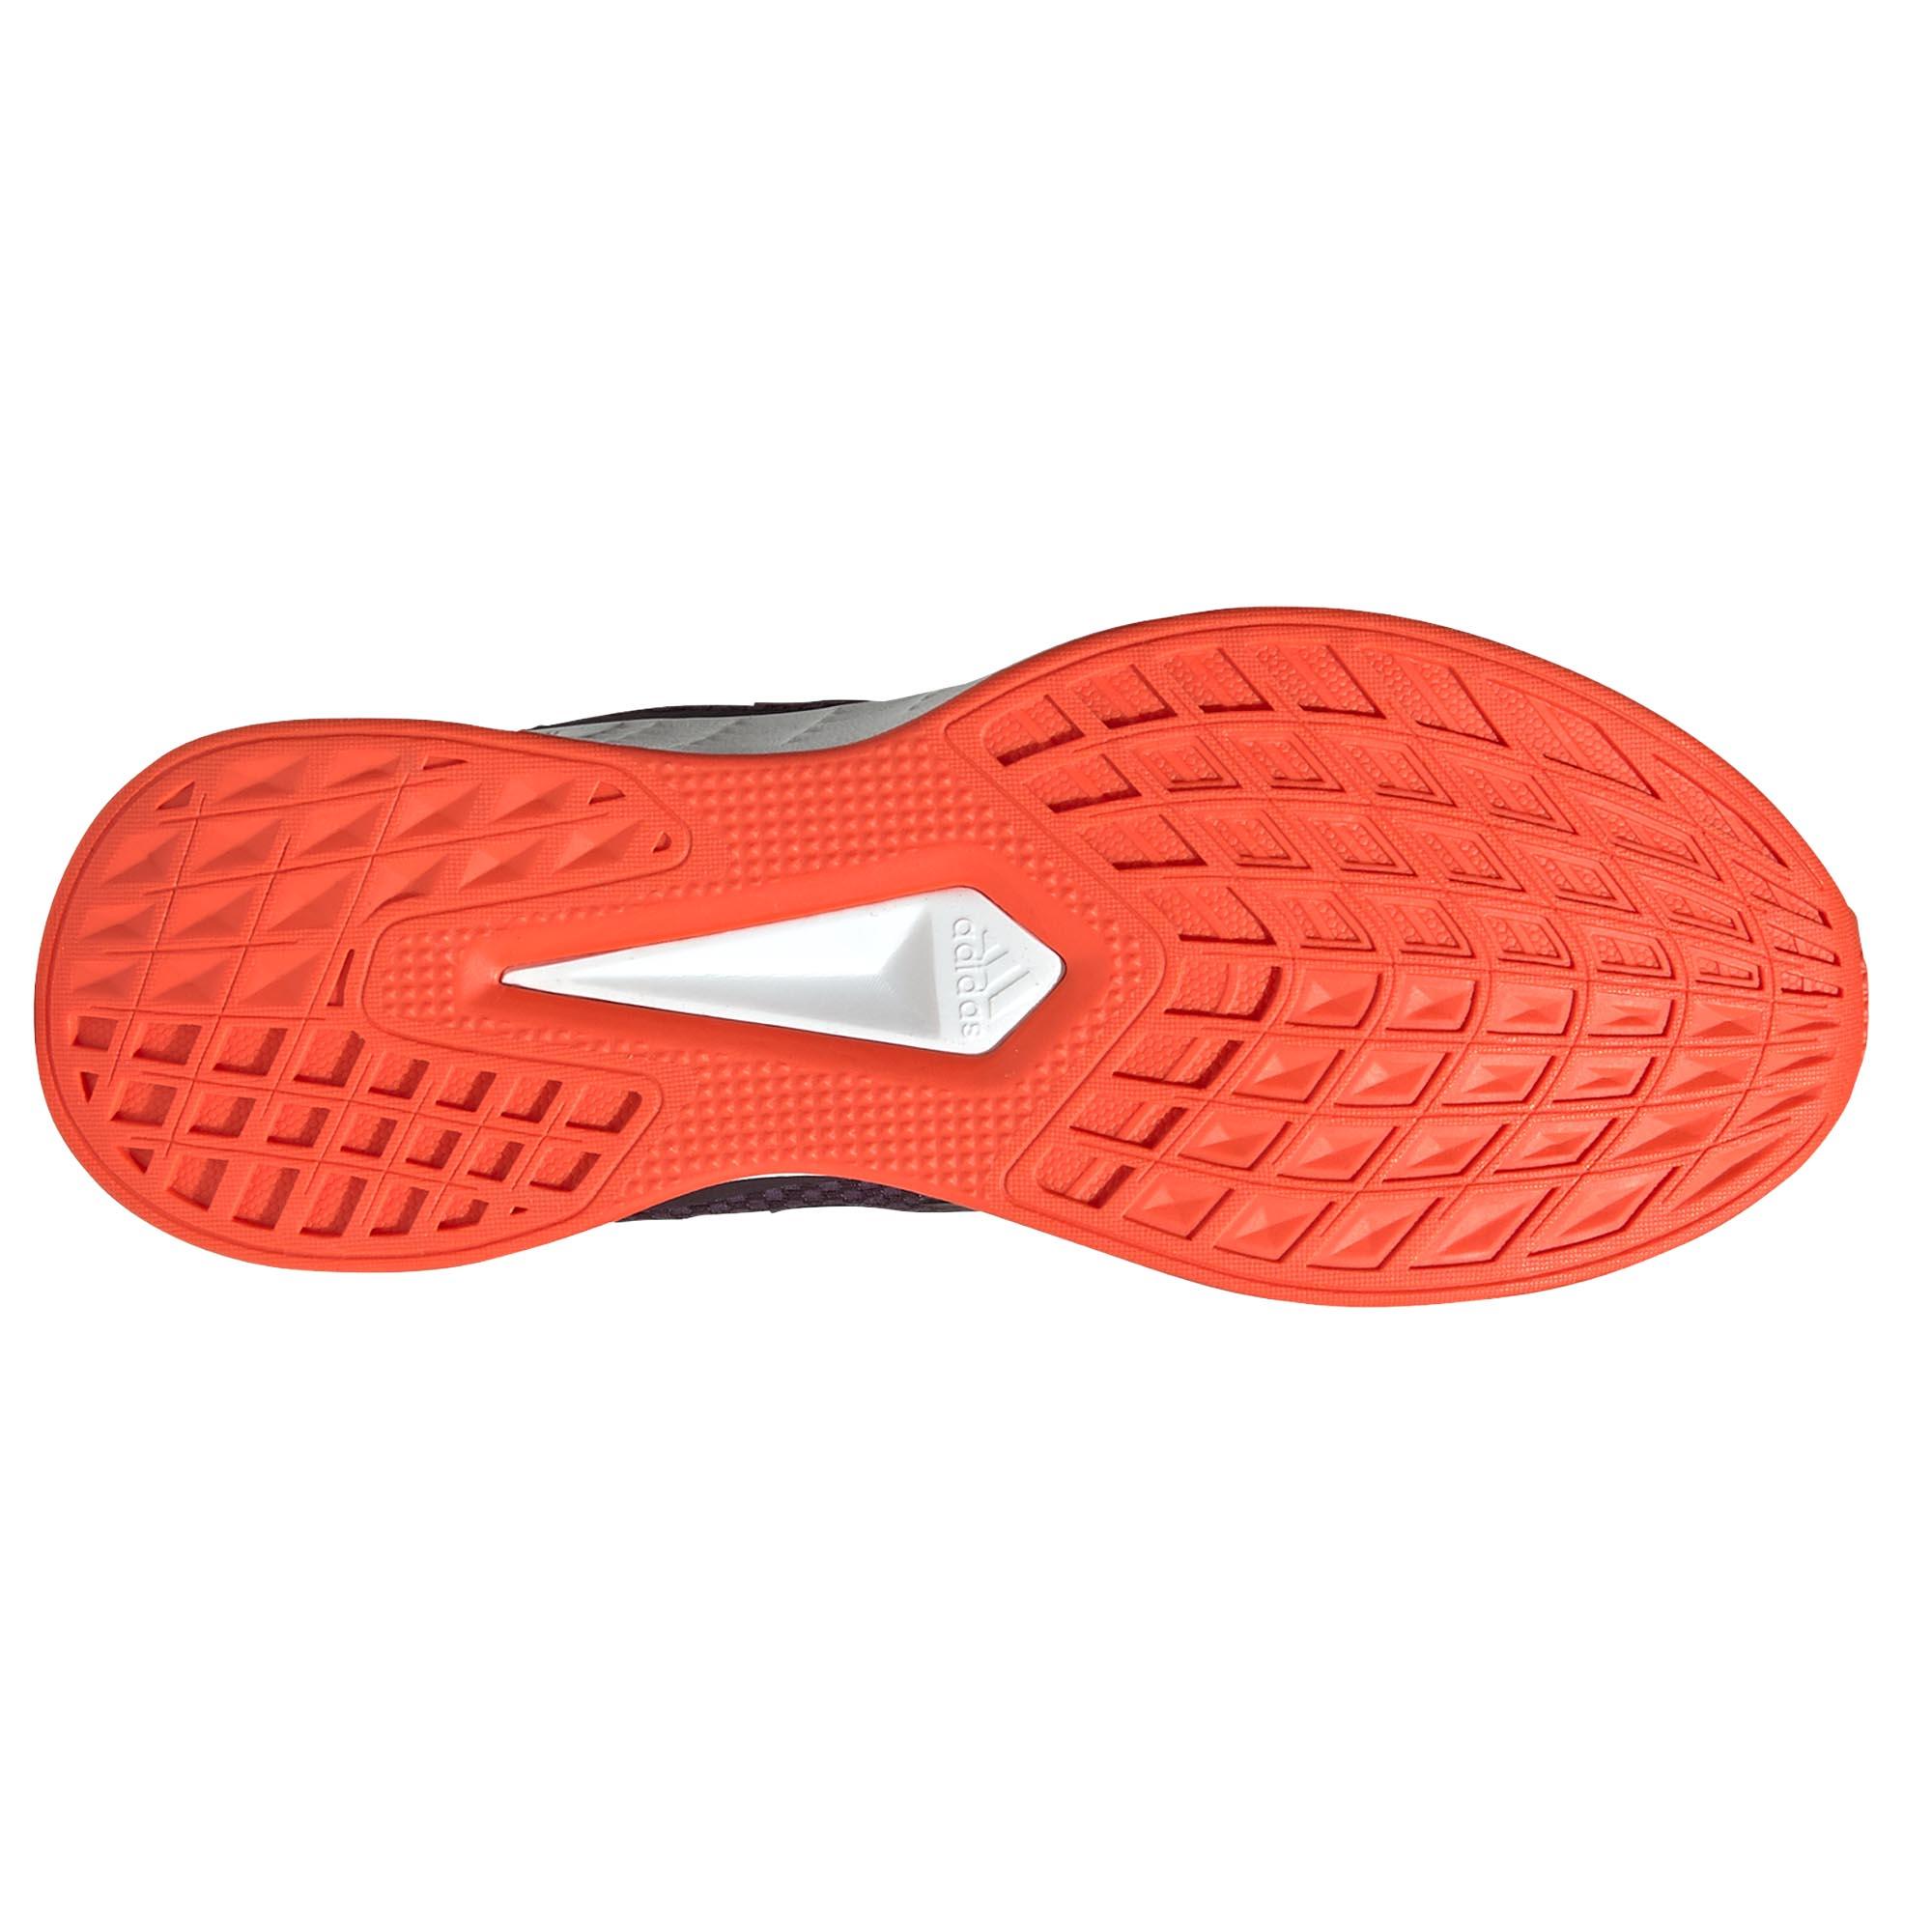 miniature 7 - Adidas Duramo SL Femme Running Fitness Sneaker Chaussure Violet/Noir/Blanc